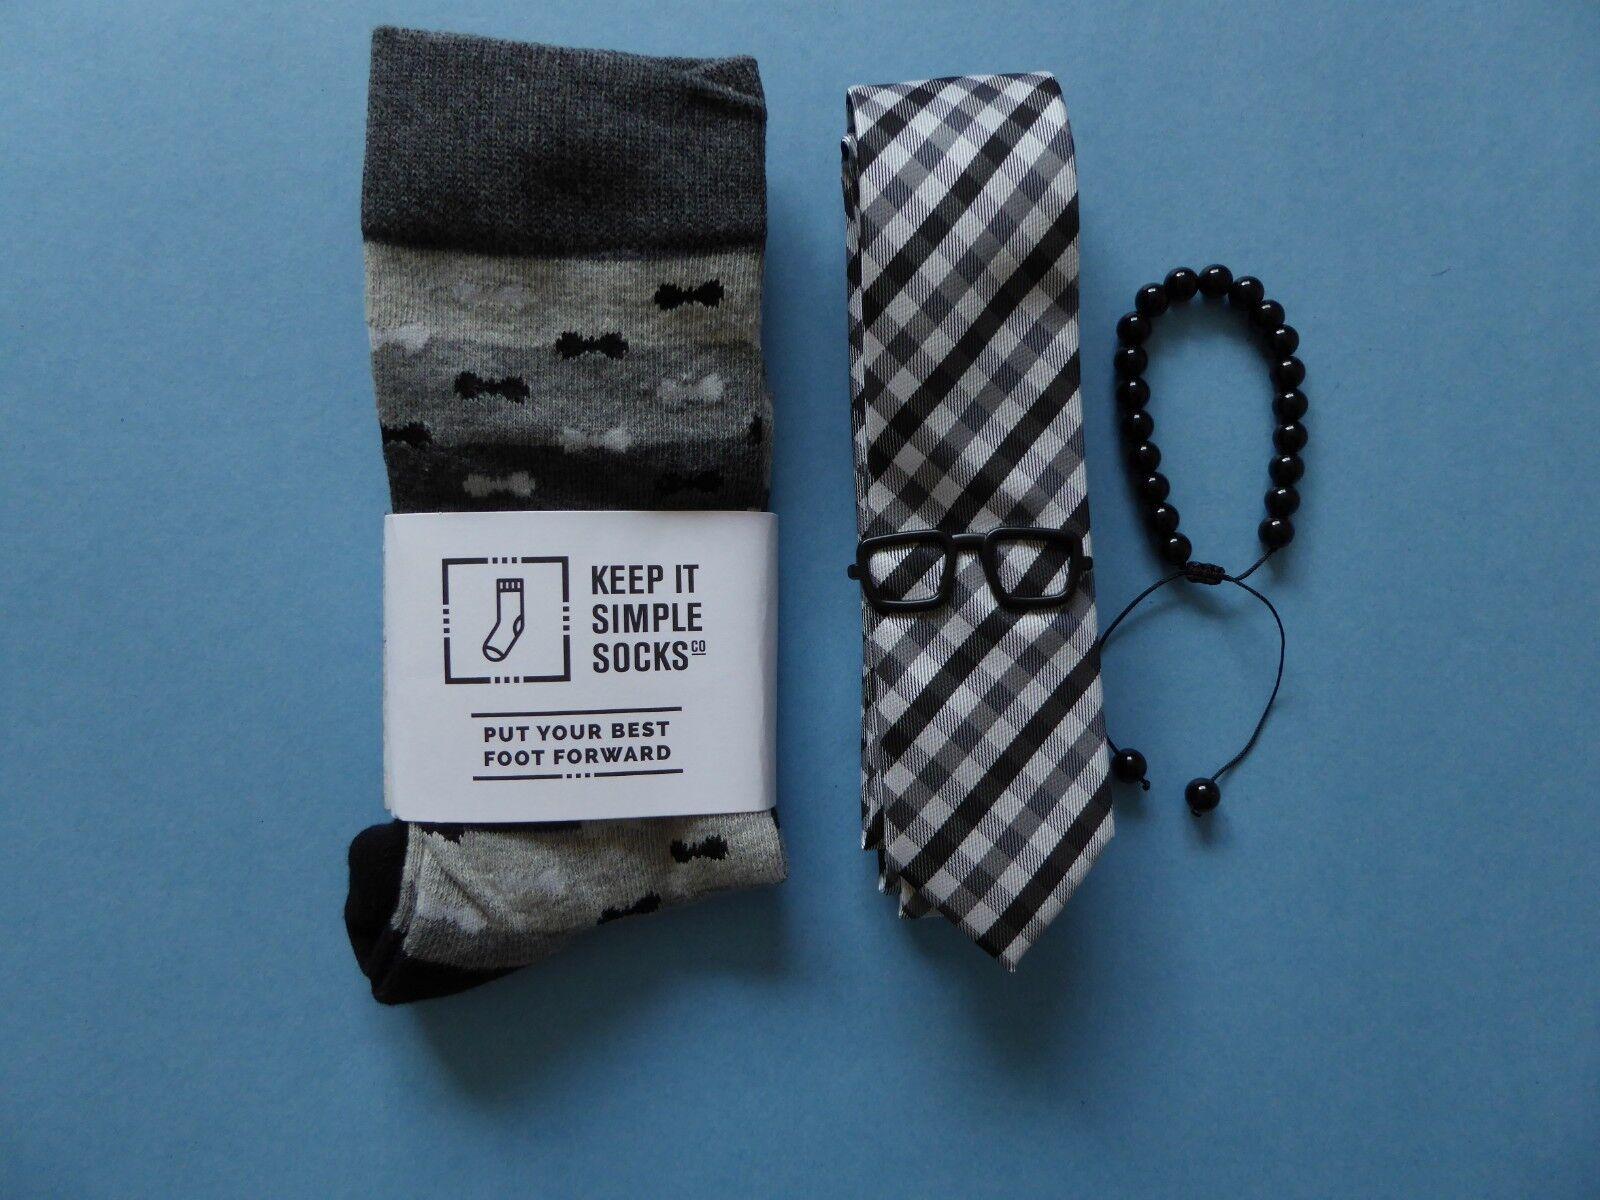 Keep it Simple Bow Tie Socks + Tropicalia Bracelet + Tie Bar + Black Gray Tie